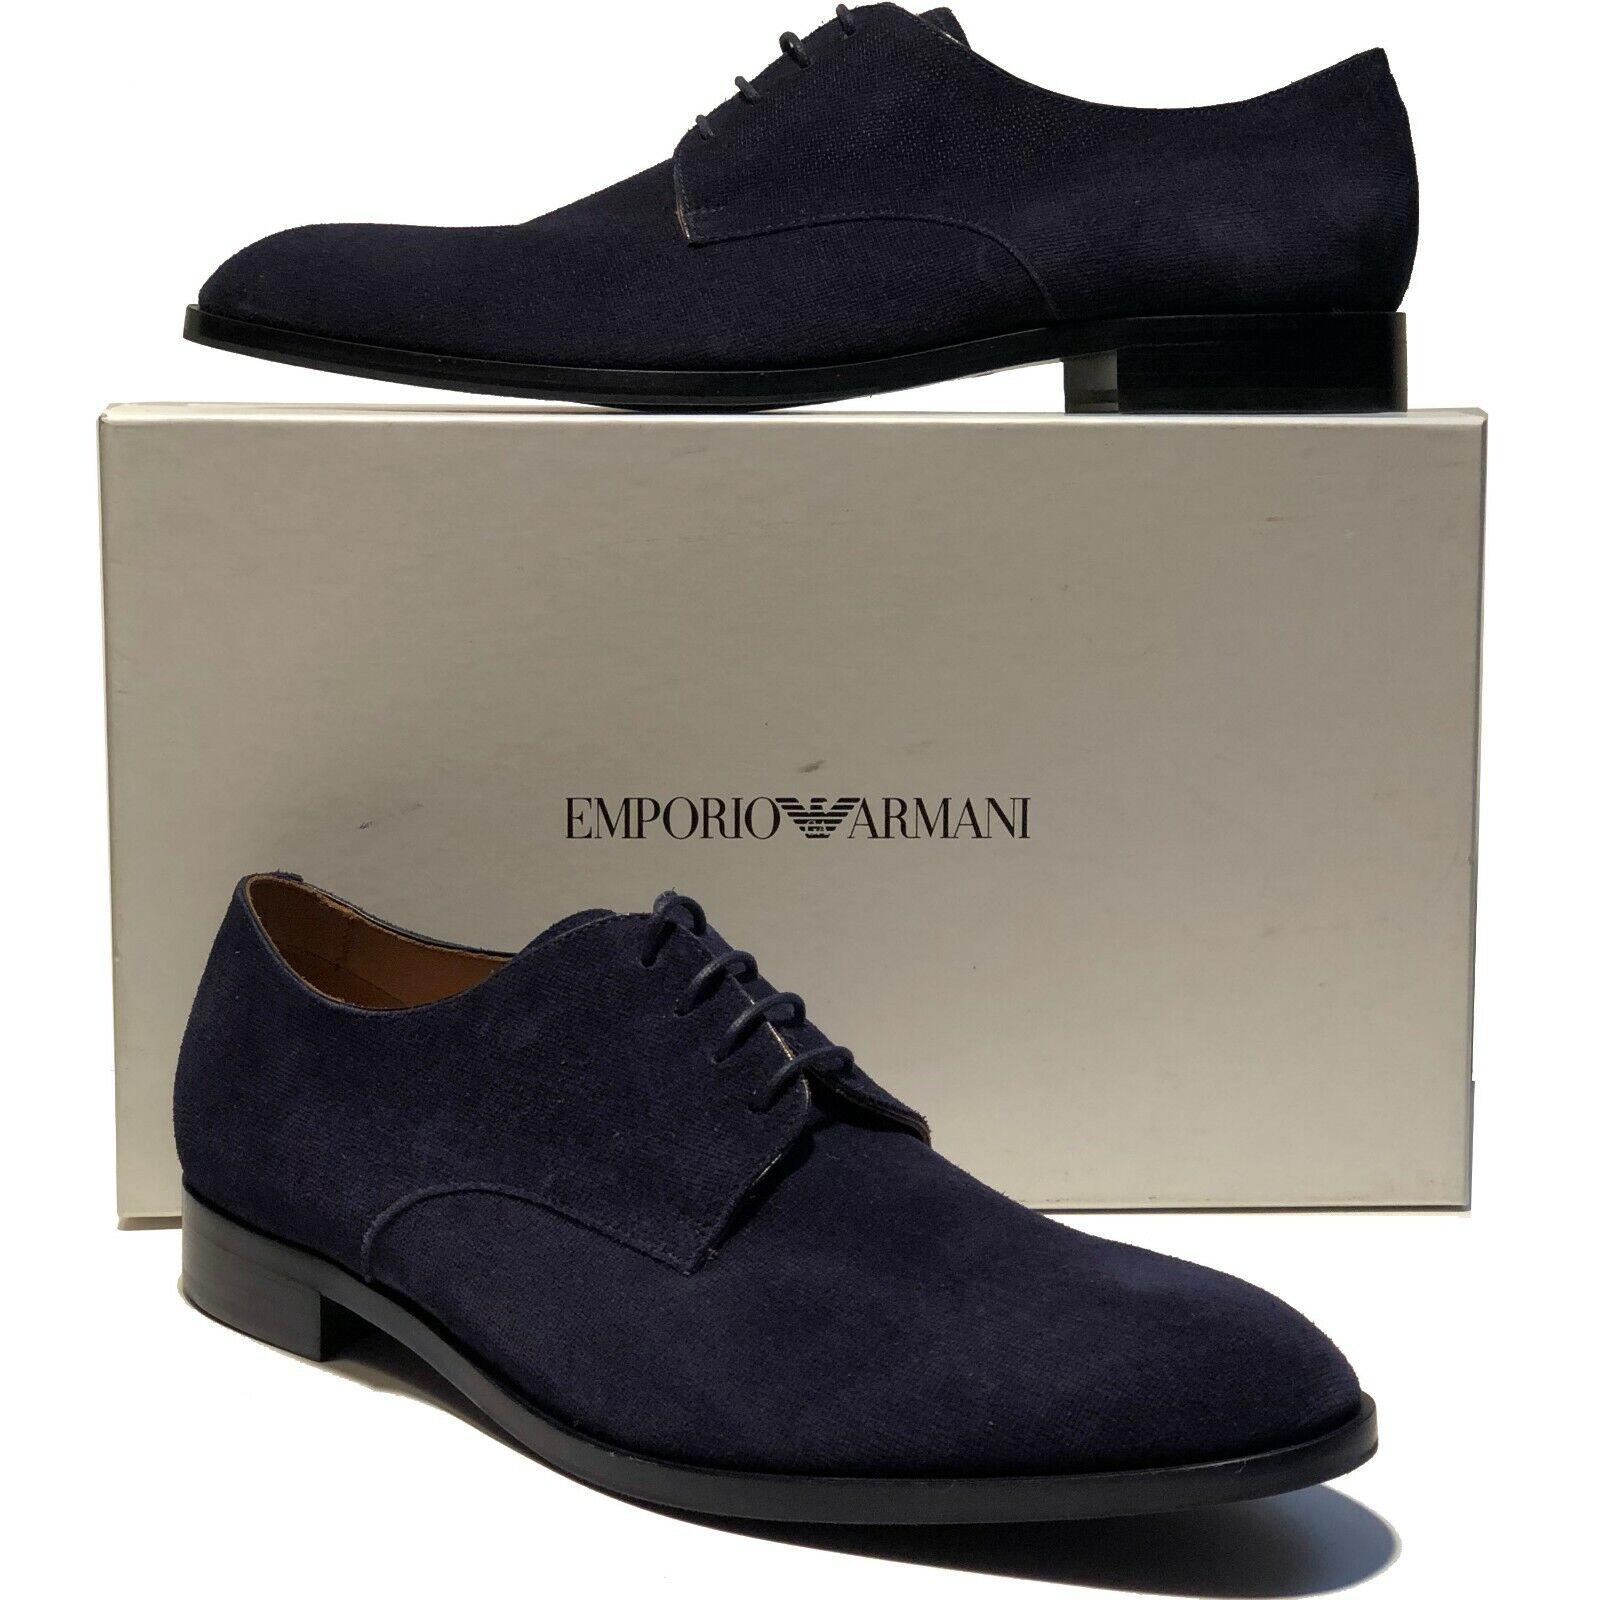 Emporio ARMANI Navy blu Suede Leather Dress Men's Fashion Oxford 12 45 Casual